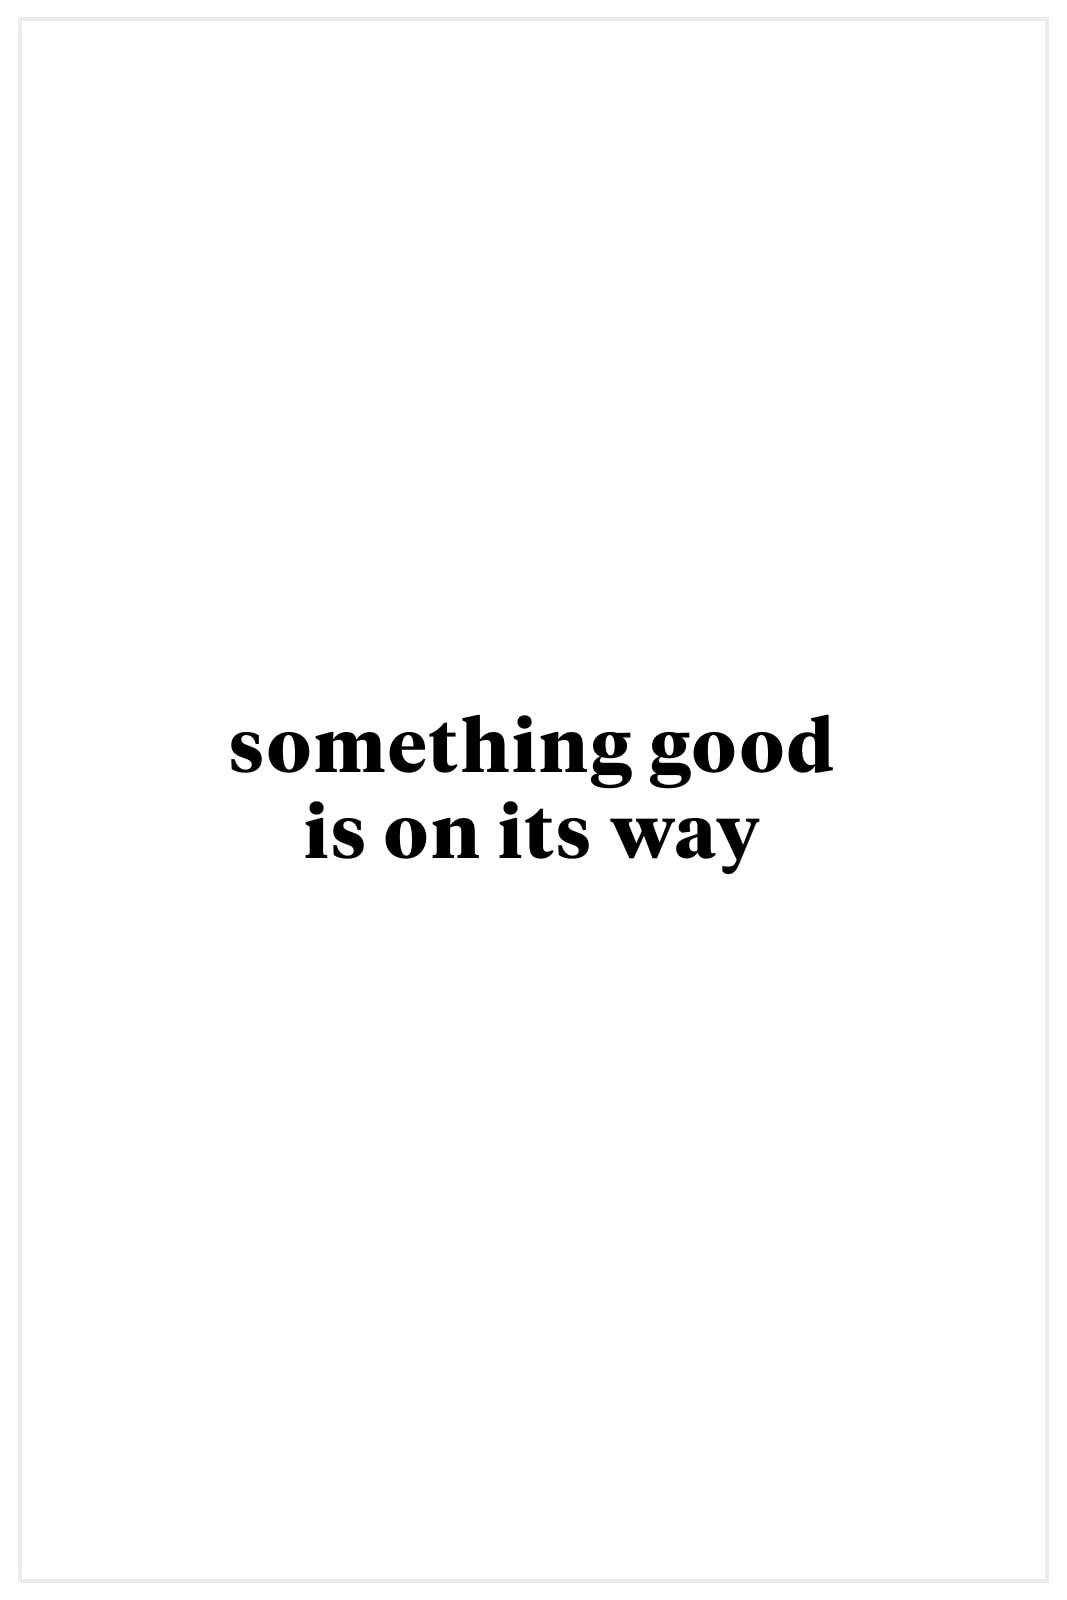 Reverie Spiral Tie Dye Dress